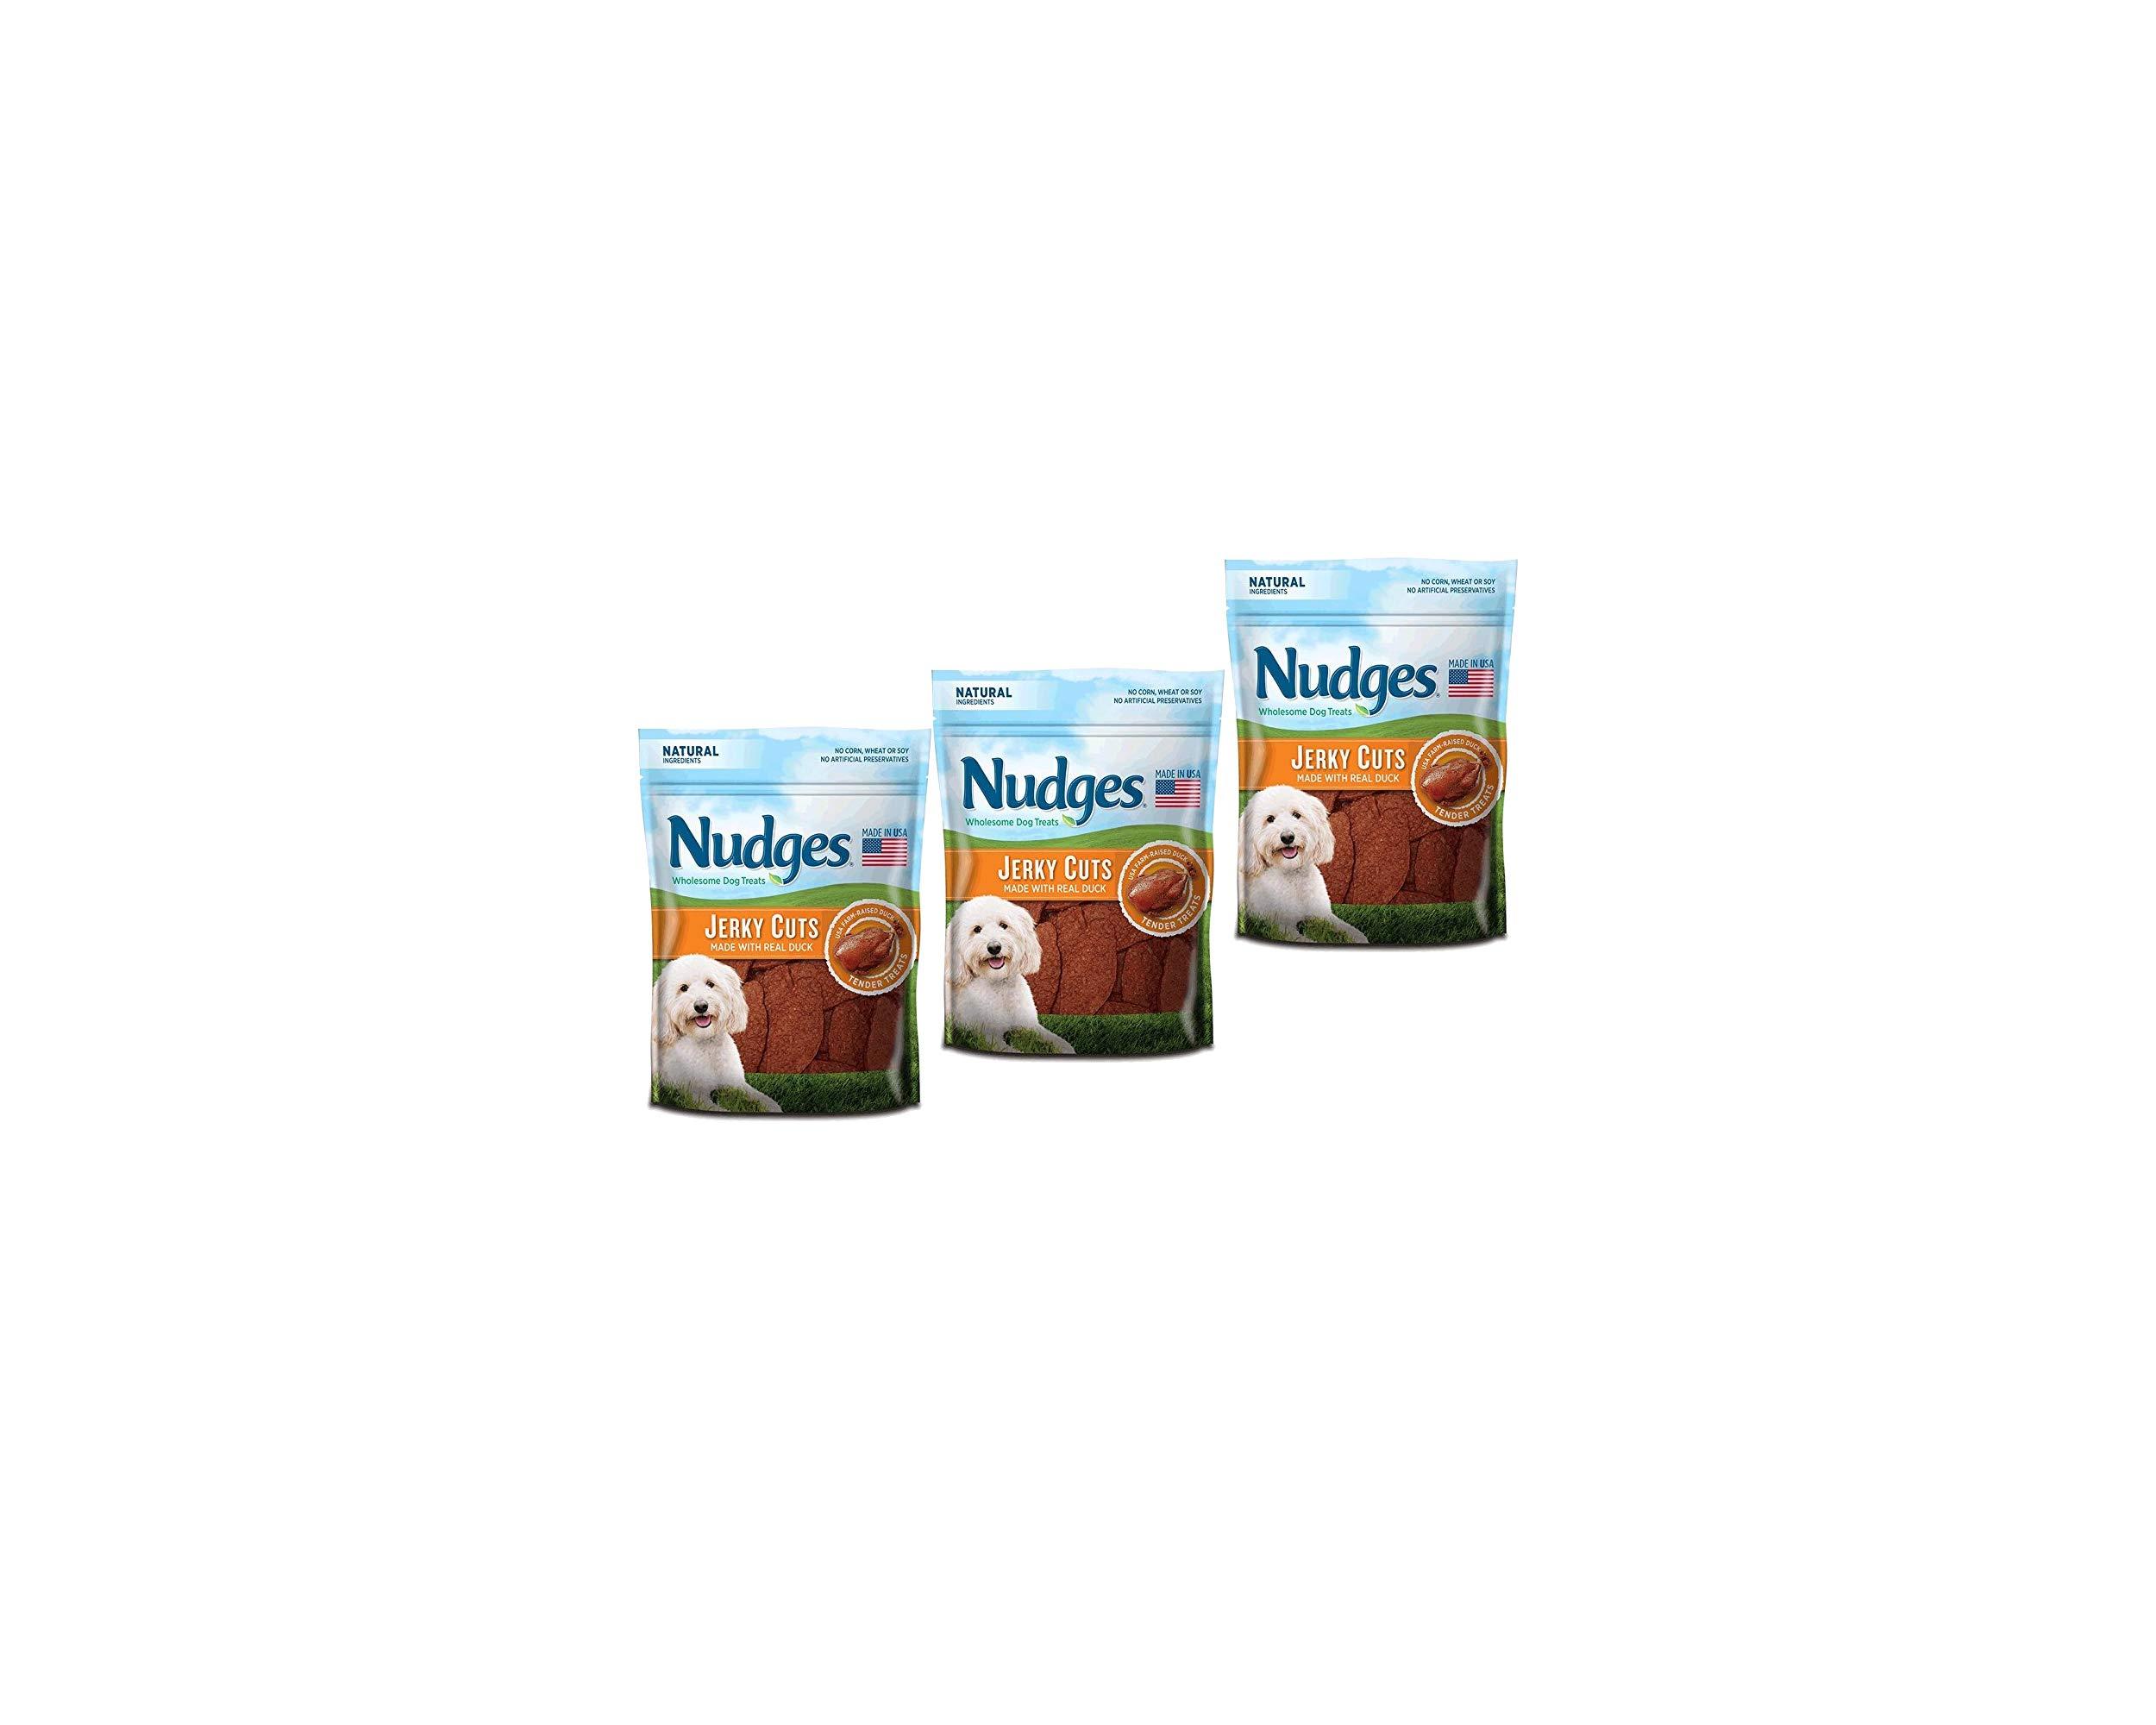 Nudges (Pack of 3) Duck Jerky Dog Treats, 16 oz